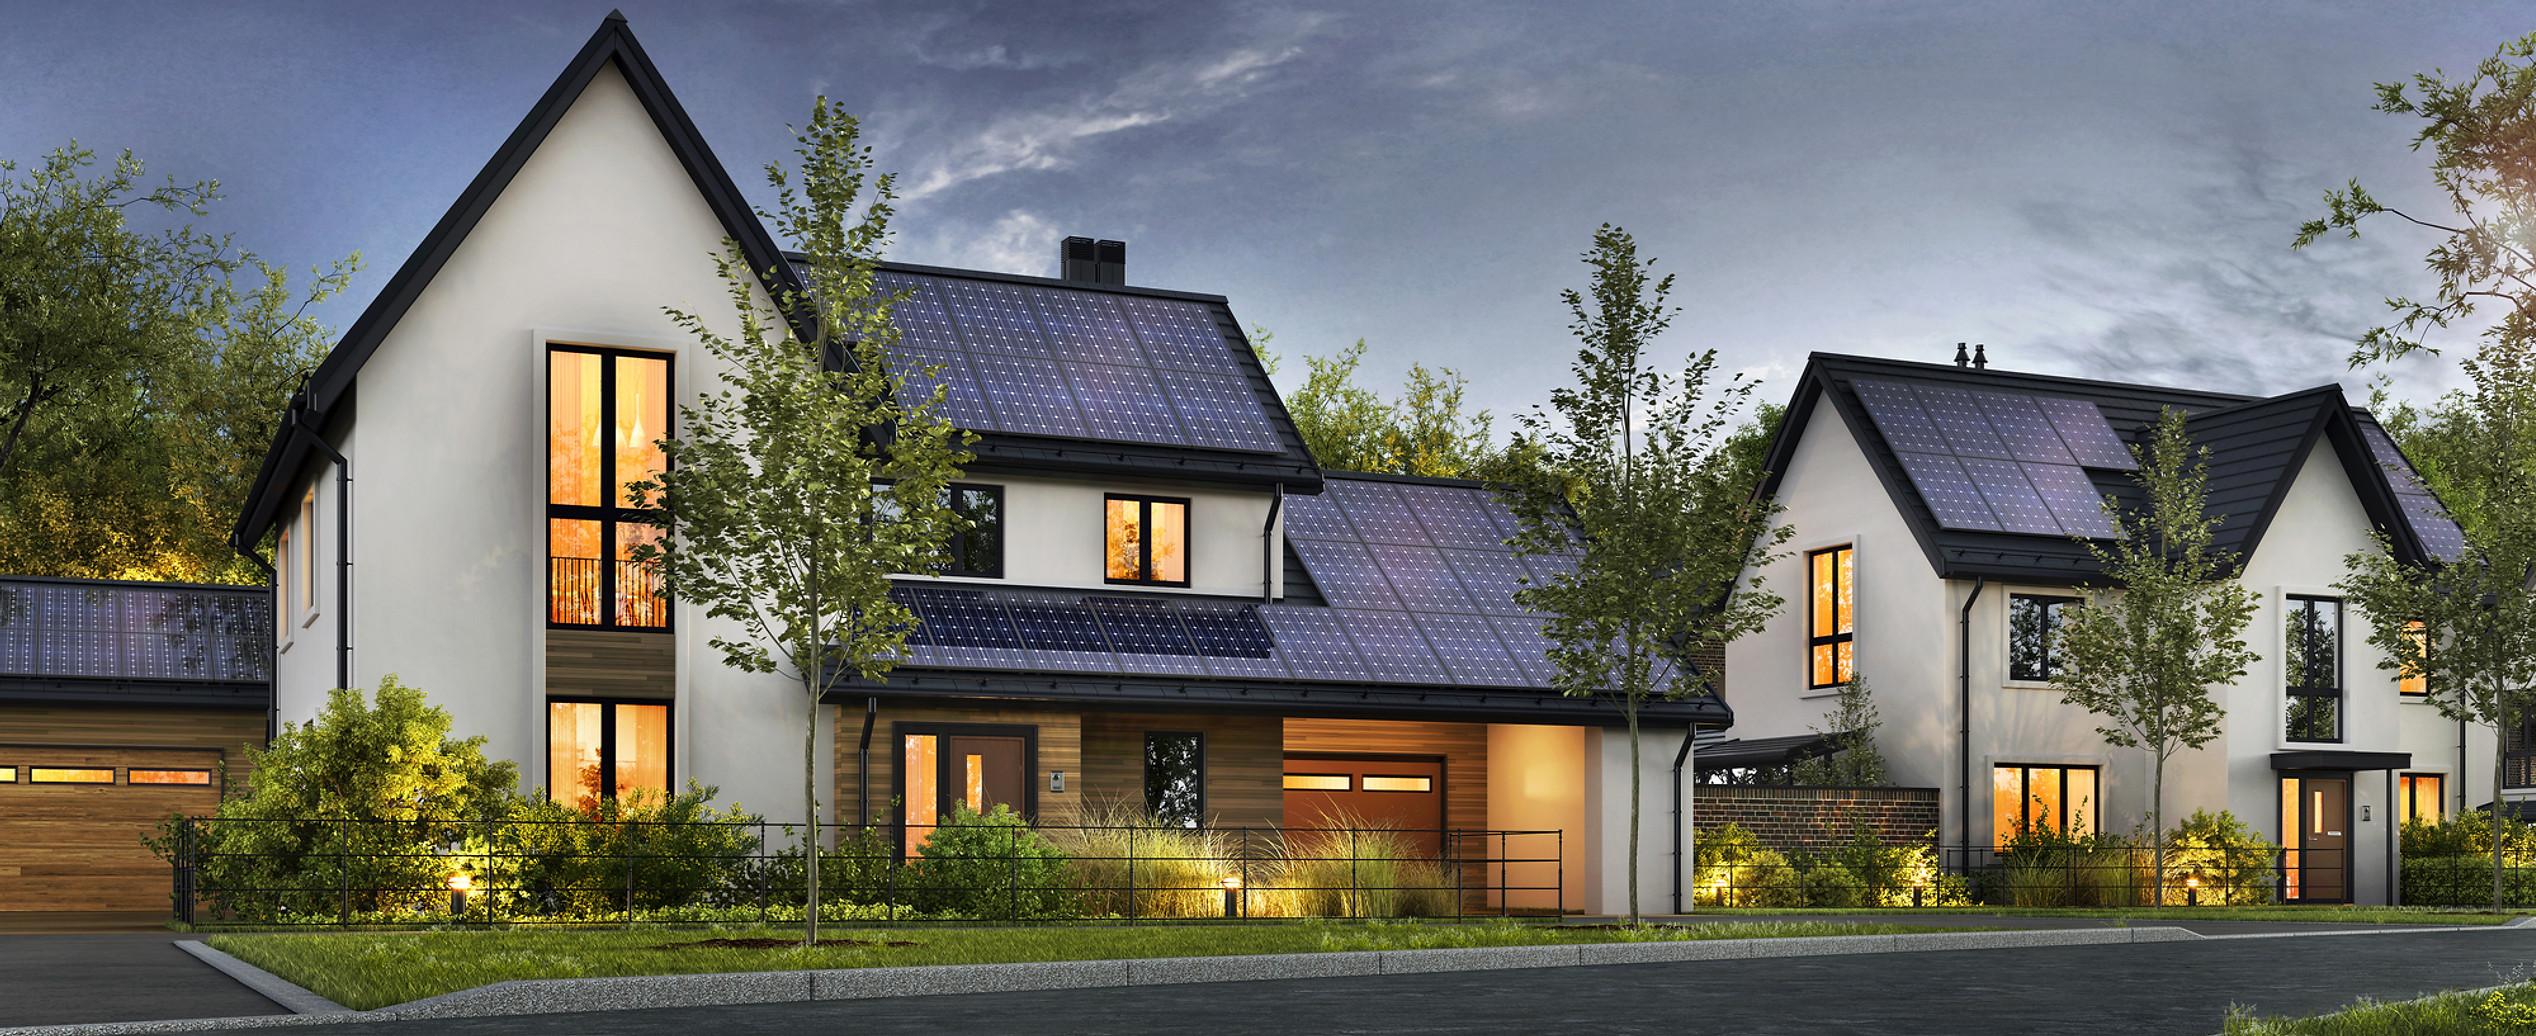 Savant Energy Large Solar Power Home